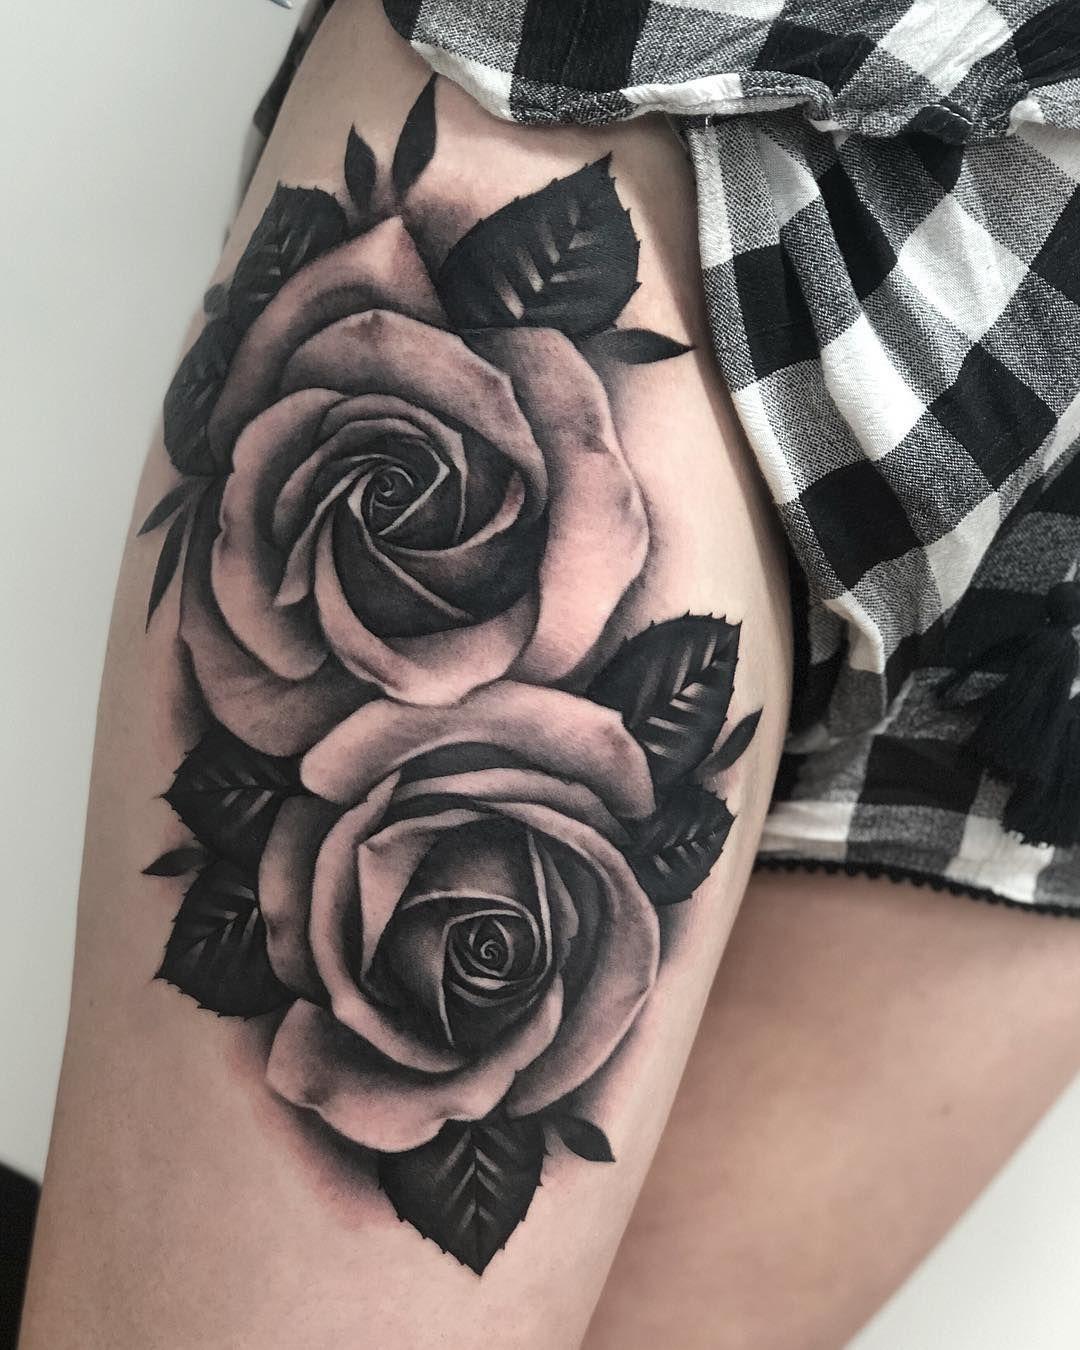 Awesome Black Gray Roses Tattoo C Tattoo Artist Chloe Aspey Rose Tattoo Thigh Rose Tattoo Design Rose Tattoos For Women